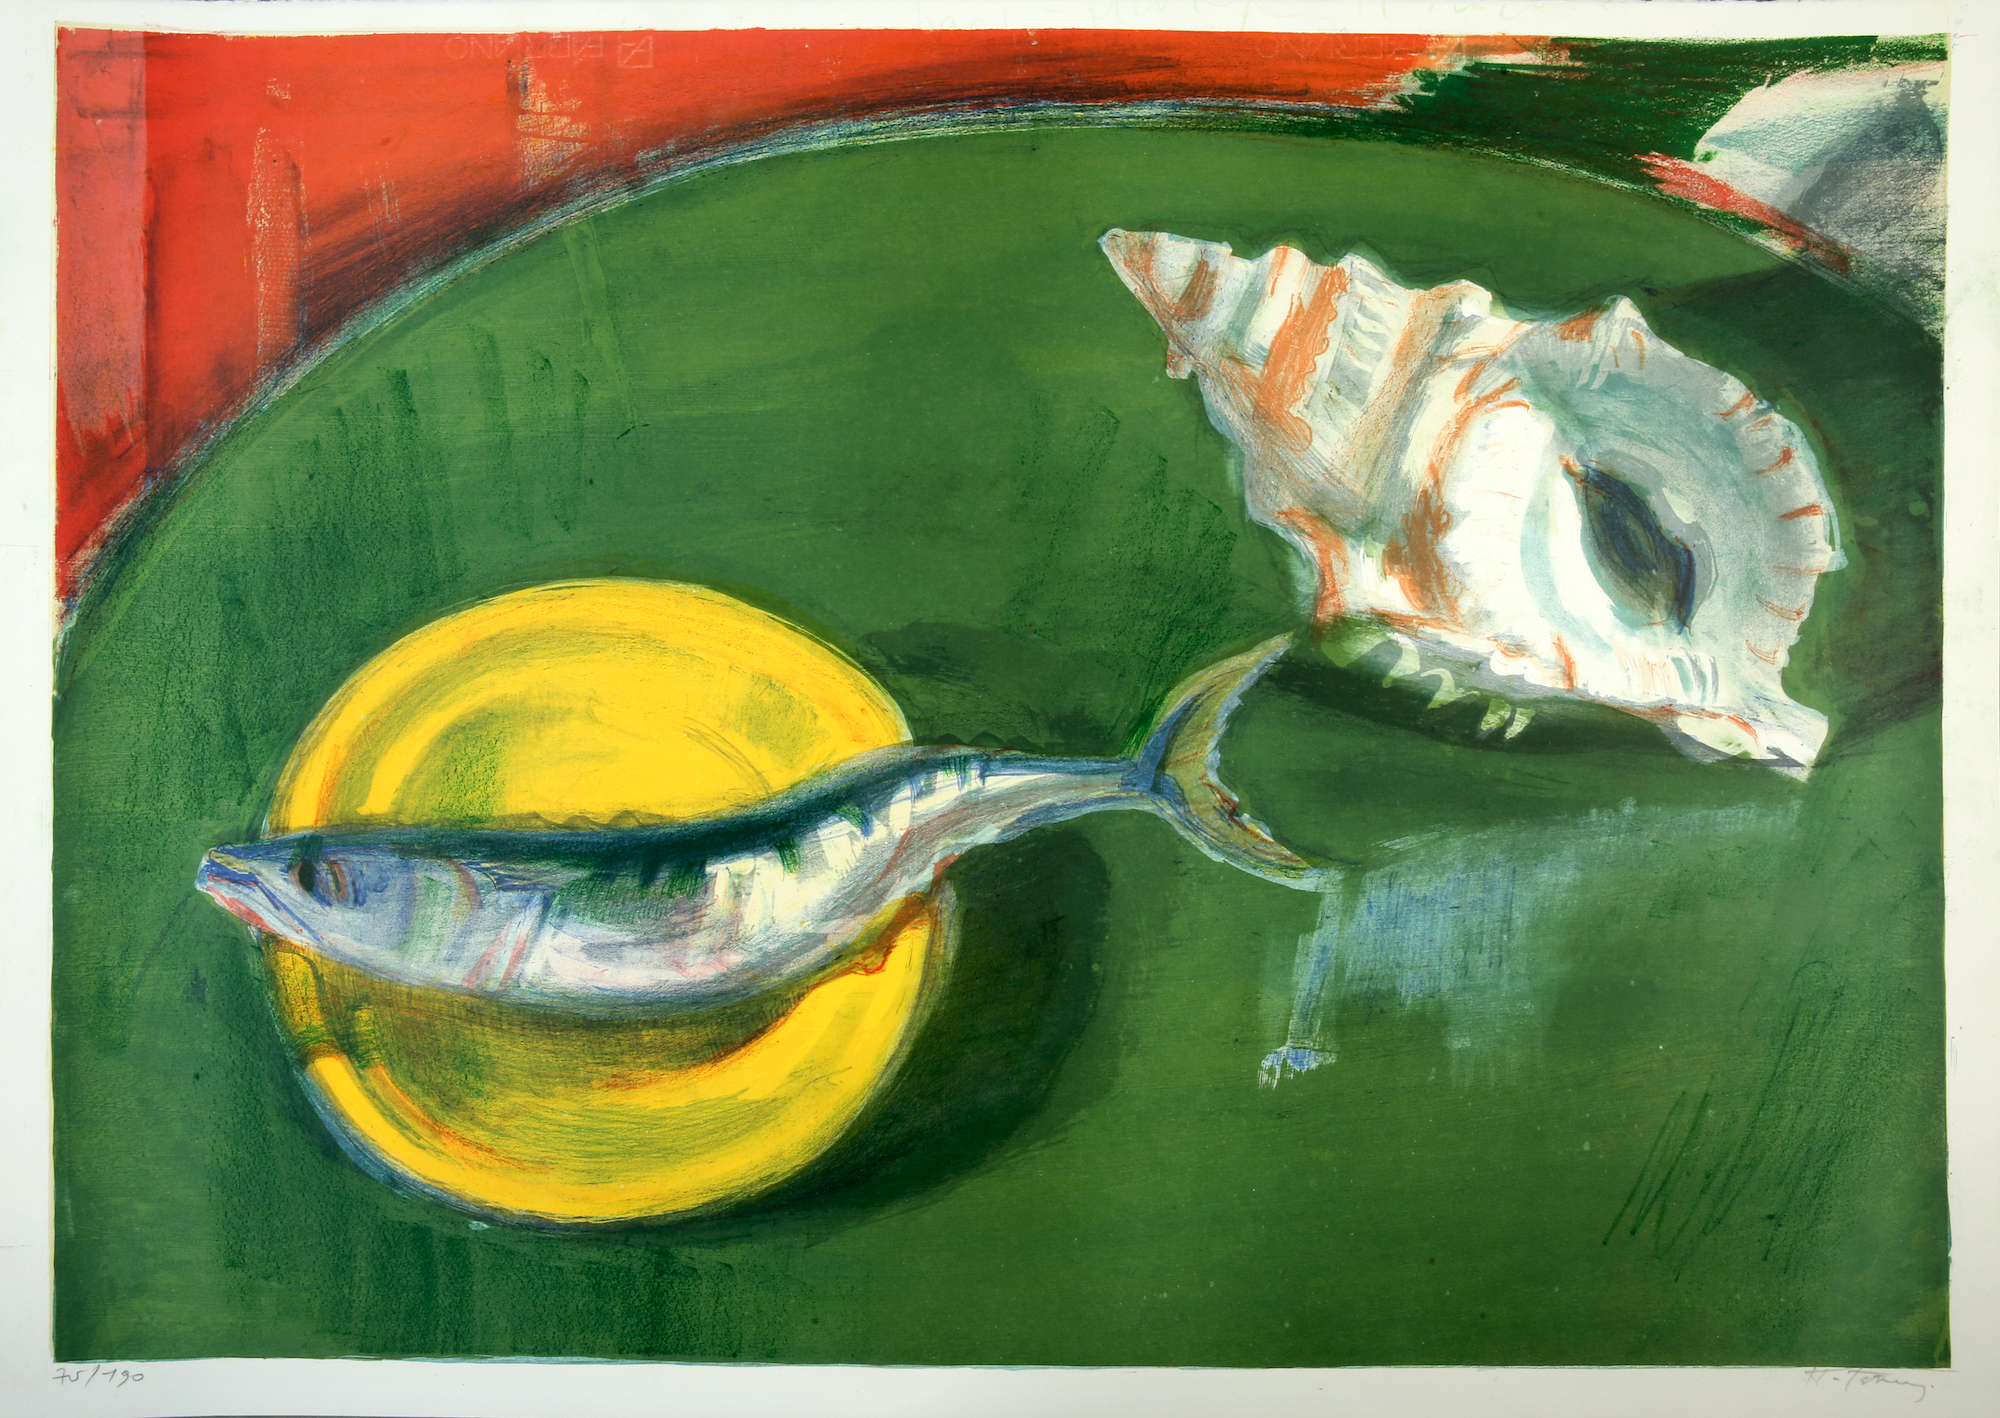 04. Panagiotis Tetsis   Still life with shell and fish